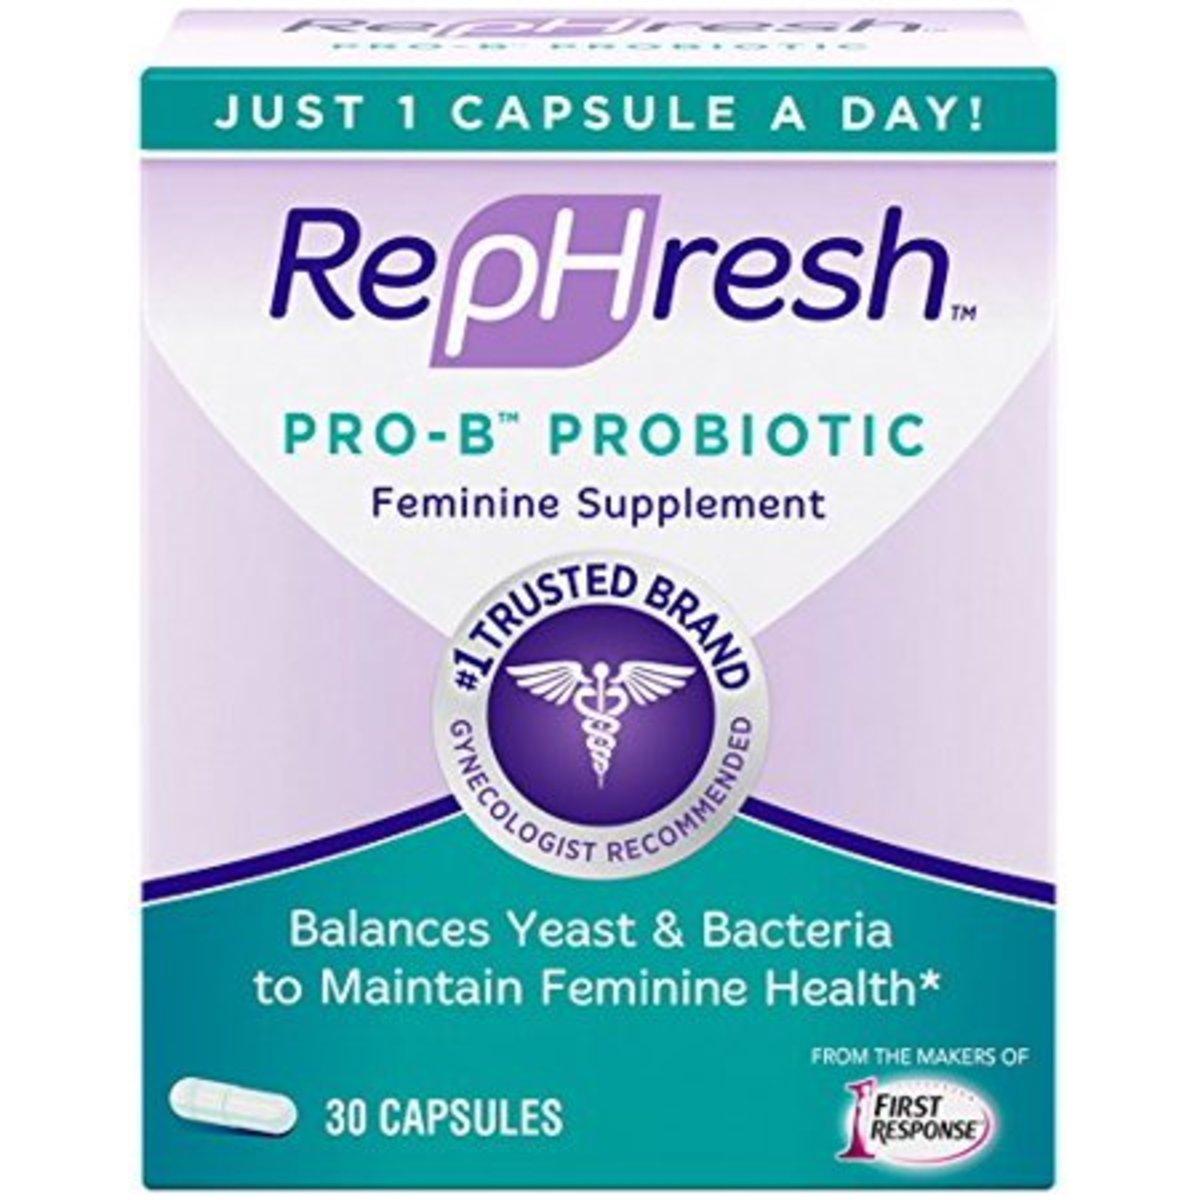 How to Balance Vaginal Flora With Probiotics - Organic Authority